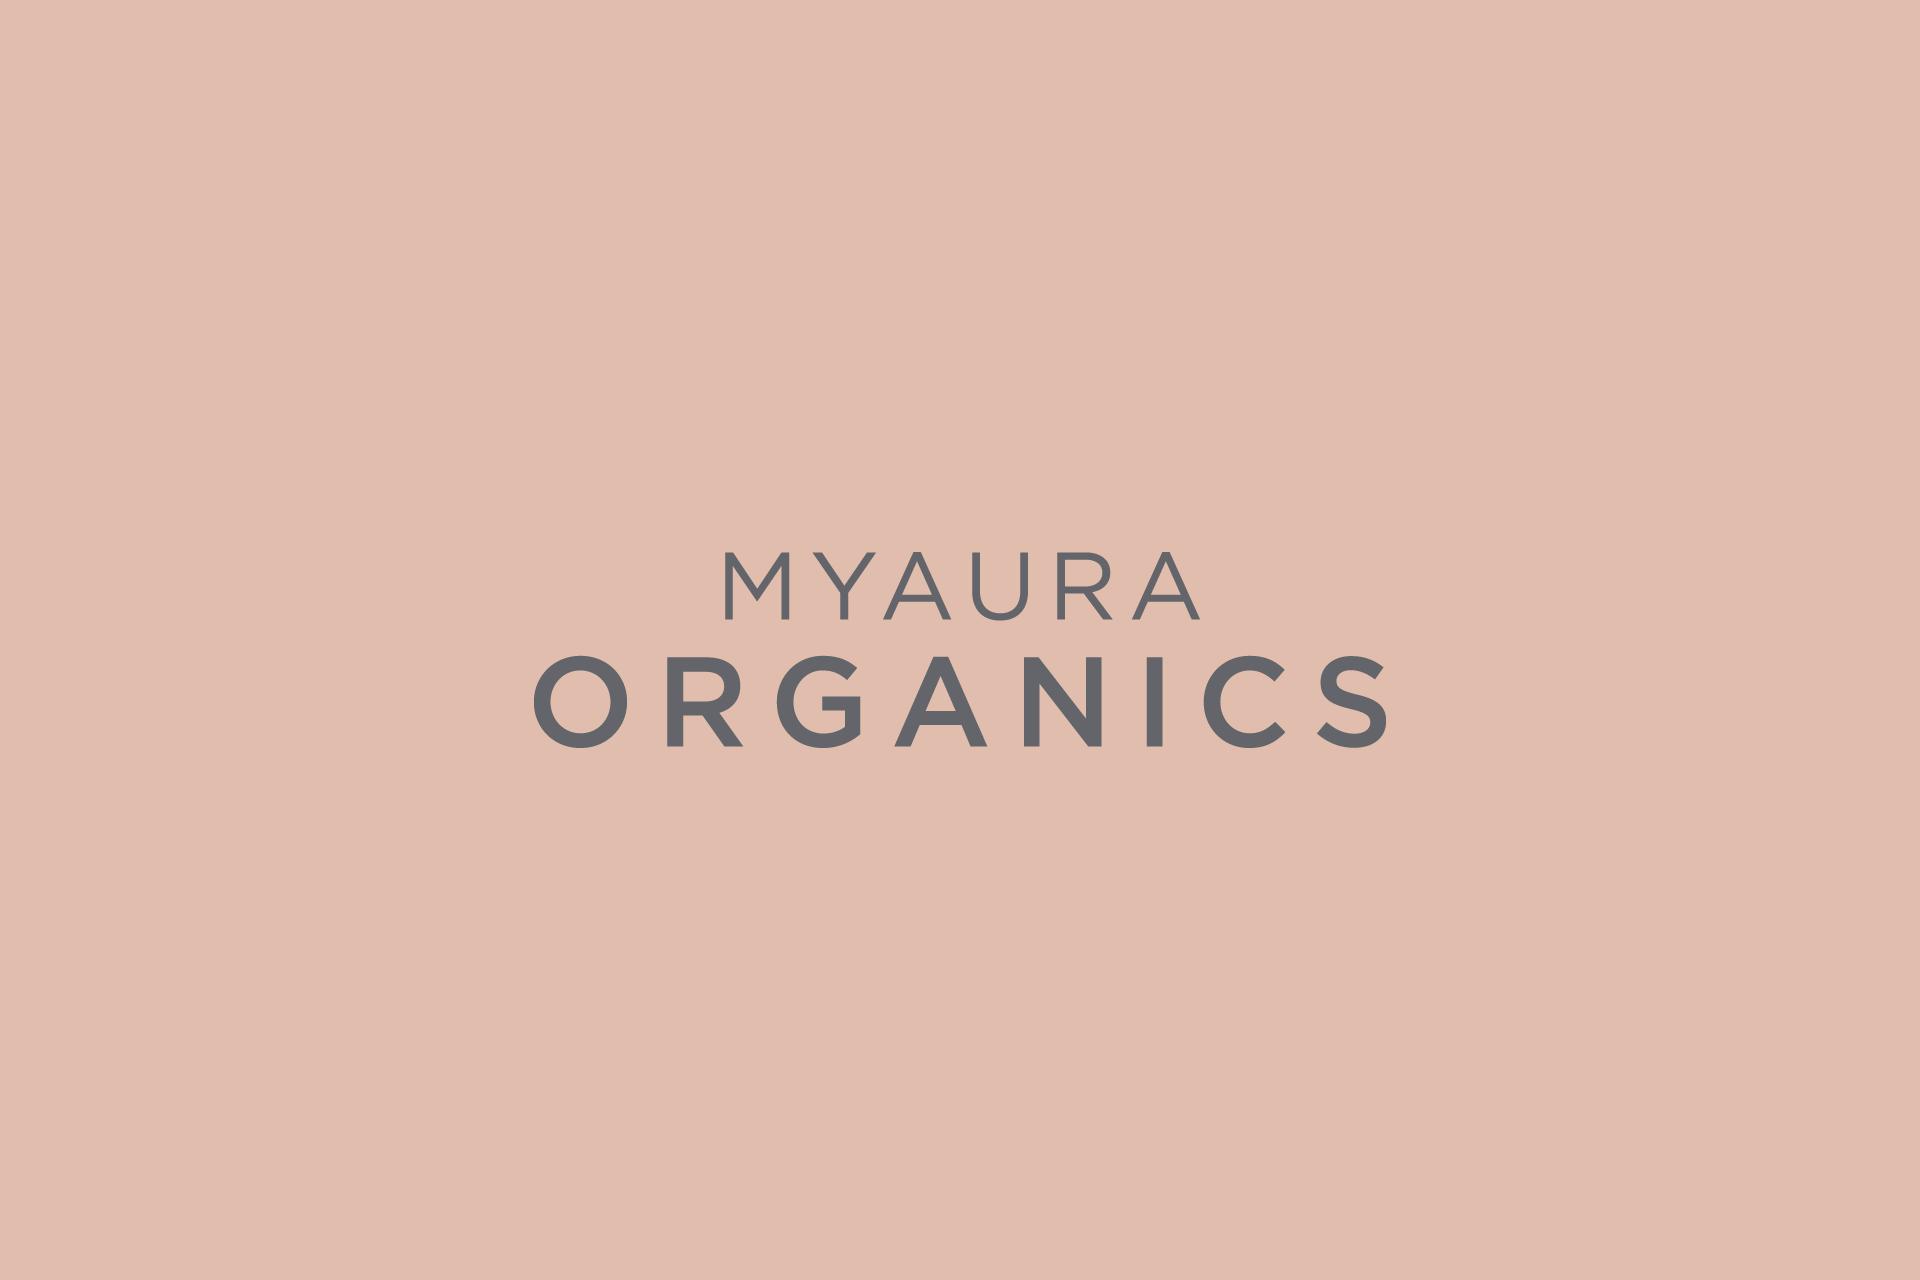 genh-logos-myaura.png